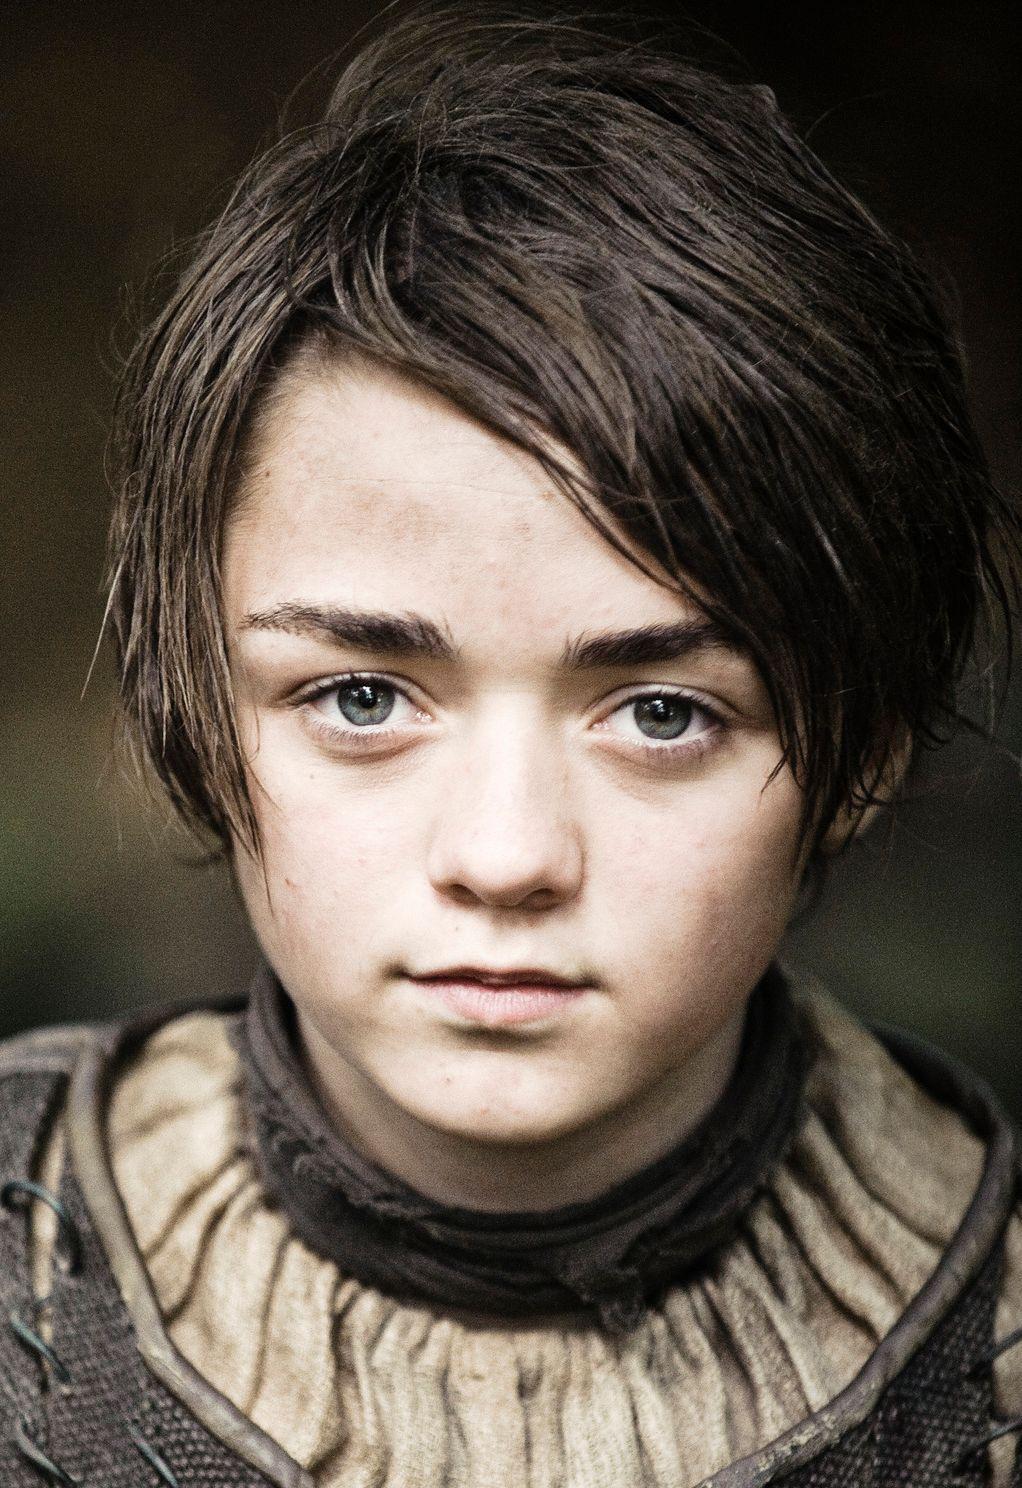 Game of Thrones star Maisie Williams, Shailene Woodley